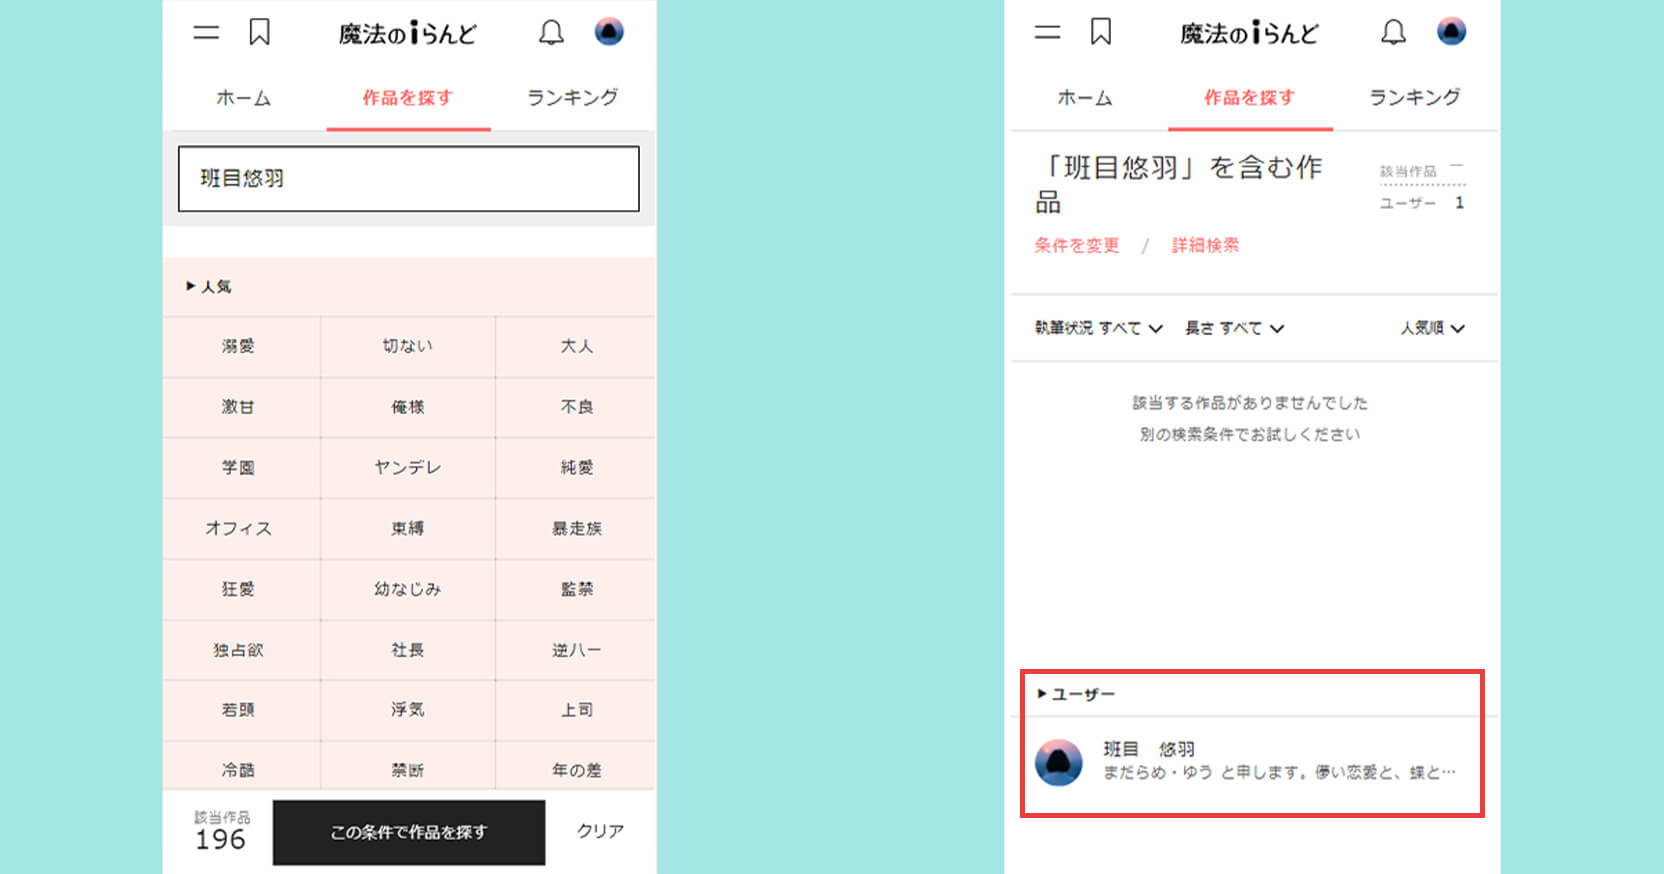 https://storage.googleapis.com/blog-info/entry/2021/06/sakkamei_blog.jpg